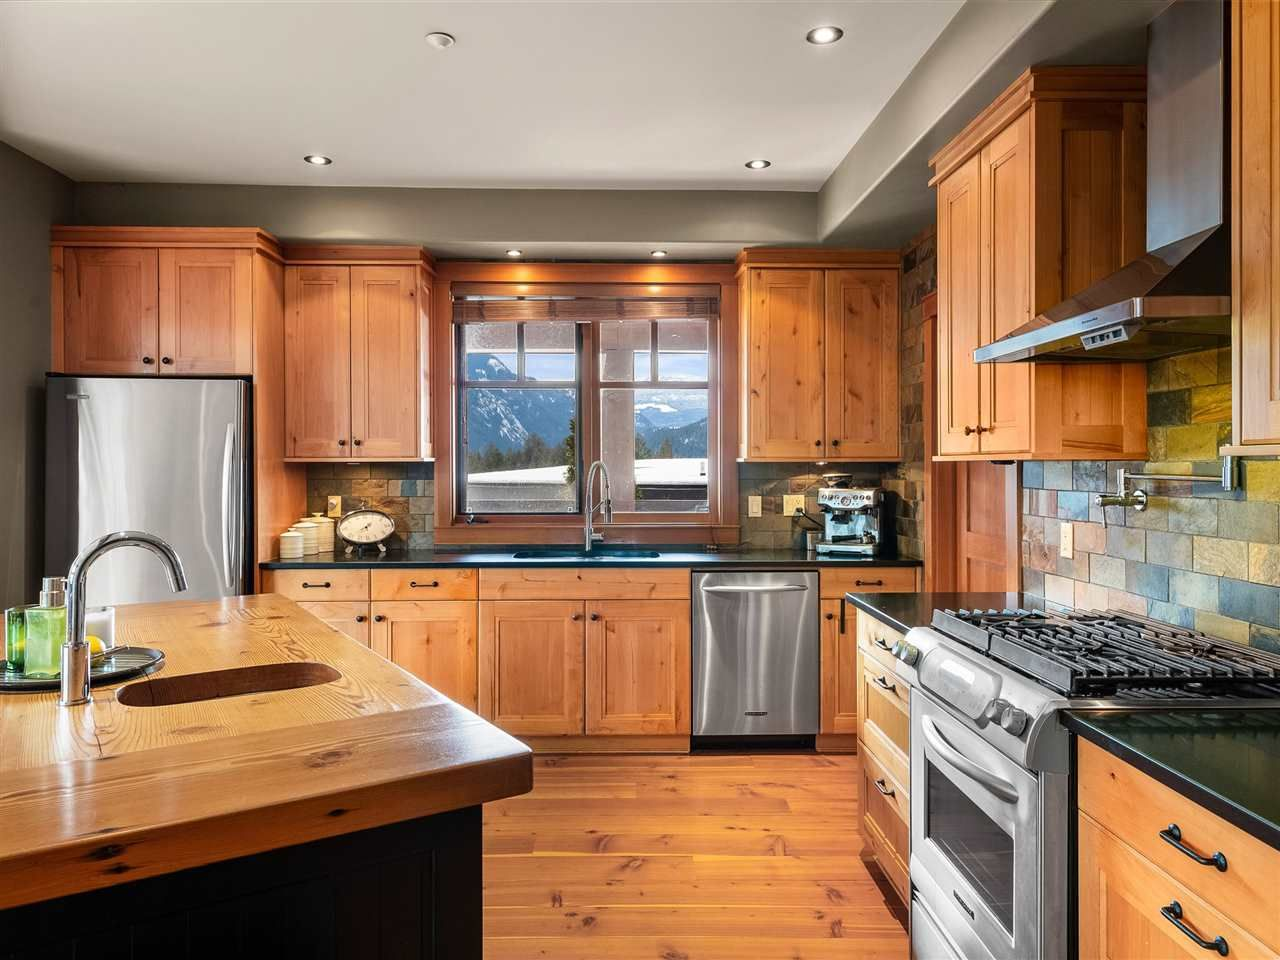 Photo 16: Photos: 1766 PINEWOOD DRIVE: Pemberton House for sale : MLS®# R2543608